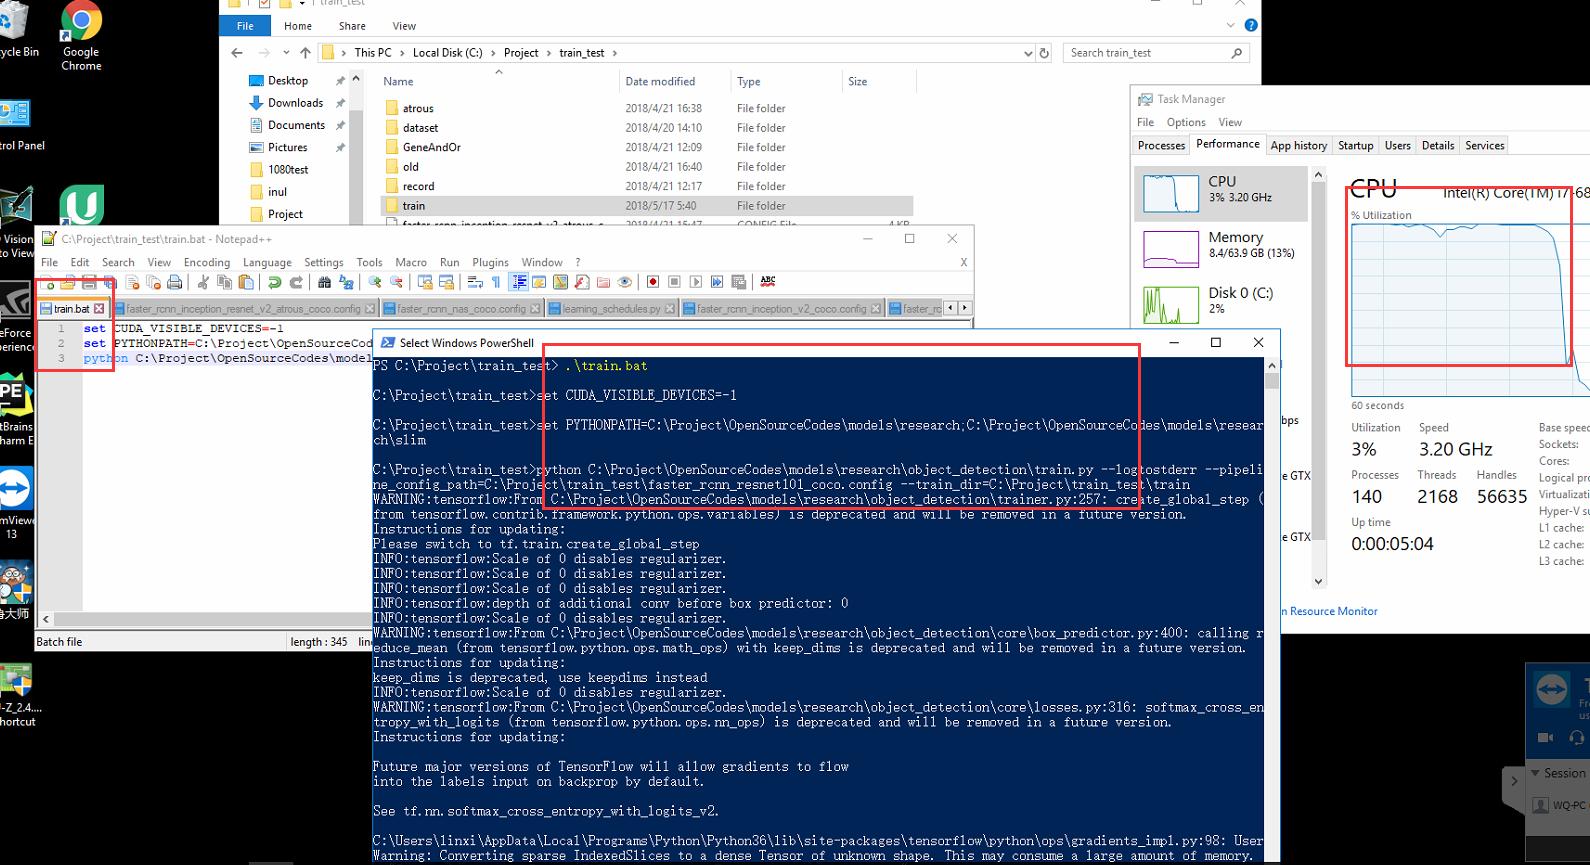 Tensorflow-gpu utilize only CPU · Issue #4282 · tensorflow/models